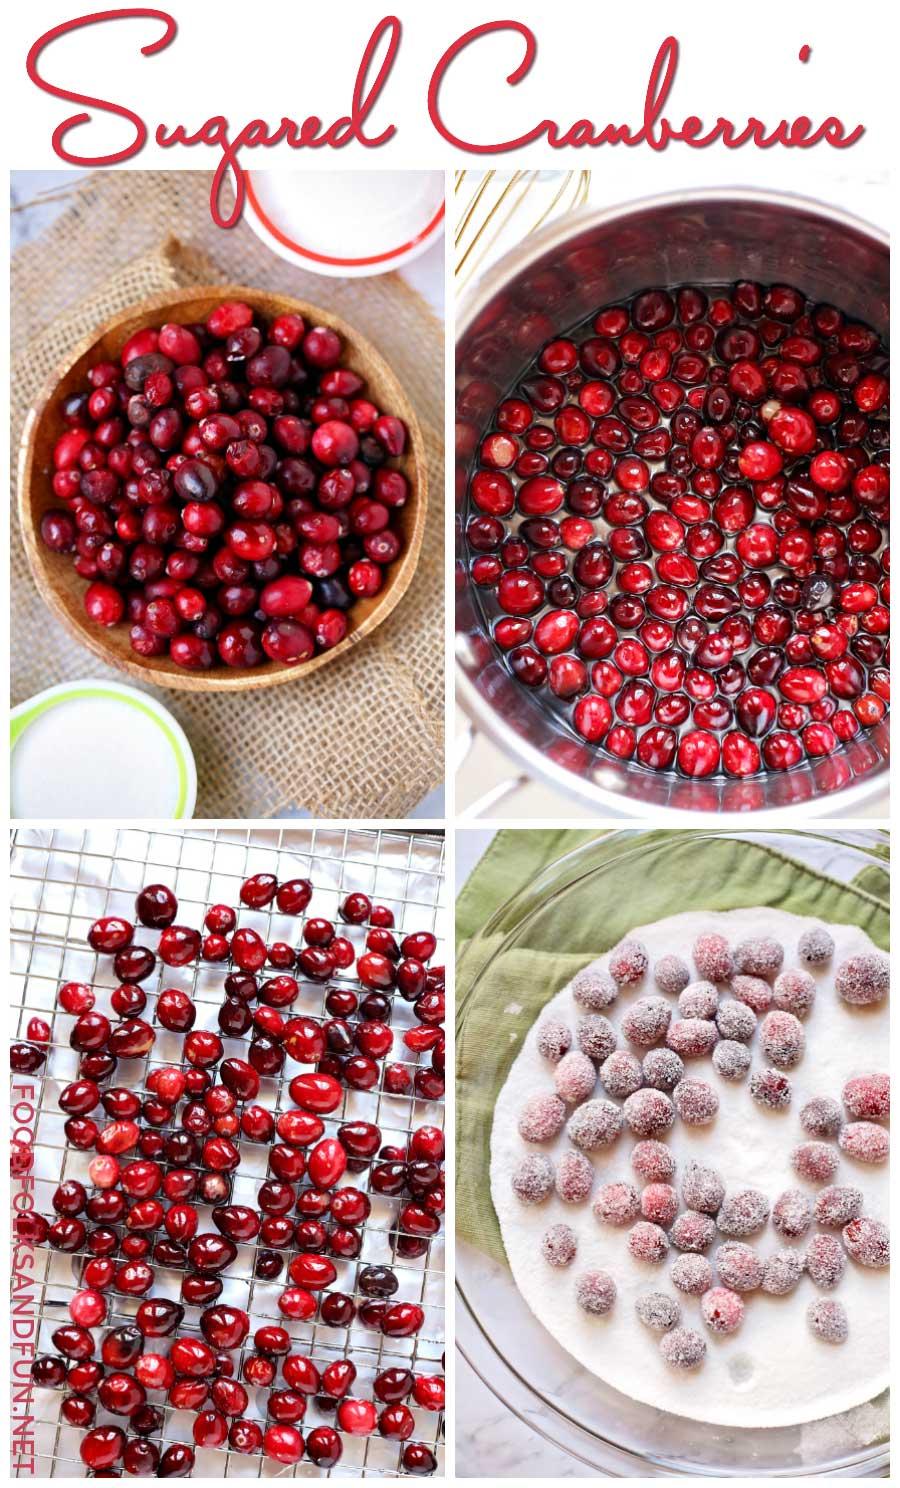 Easy Sugared Cranberries Tutorial